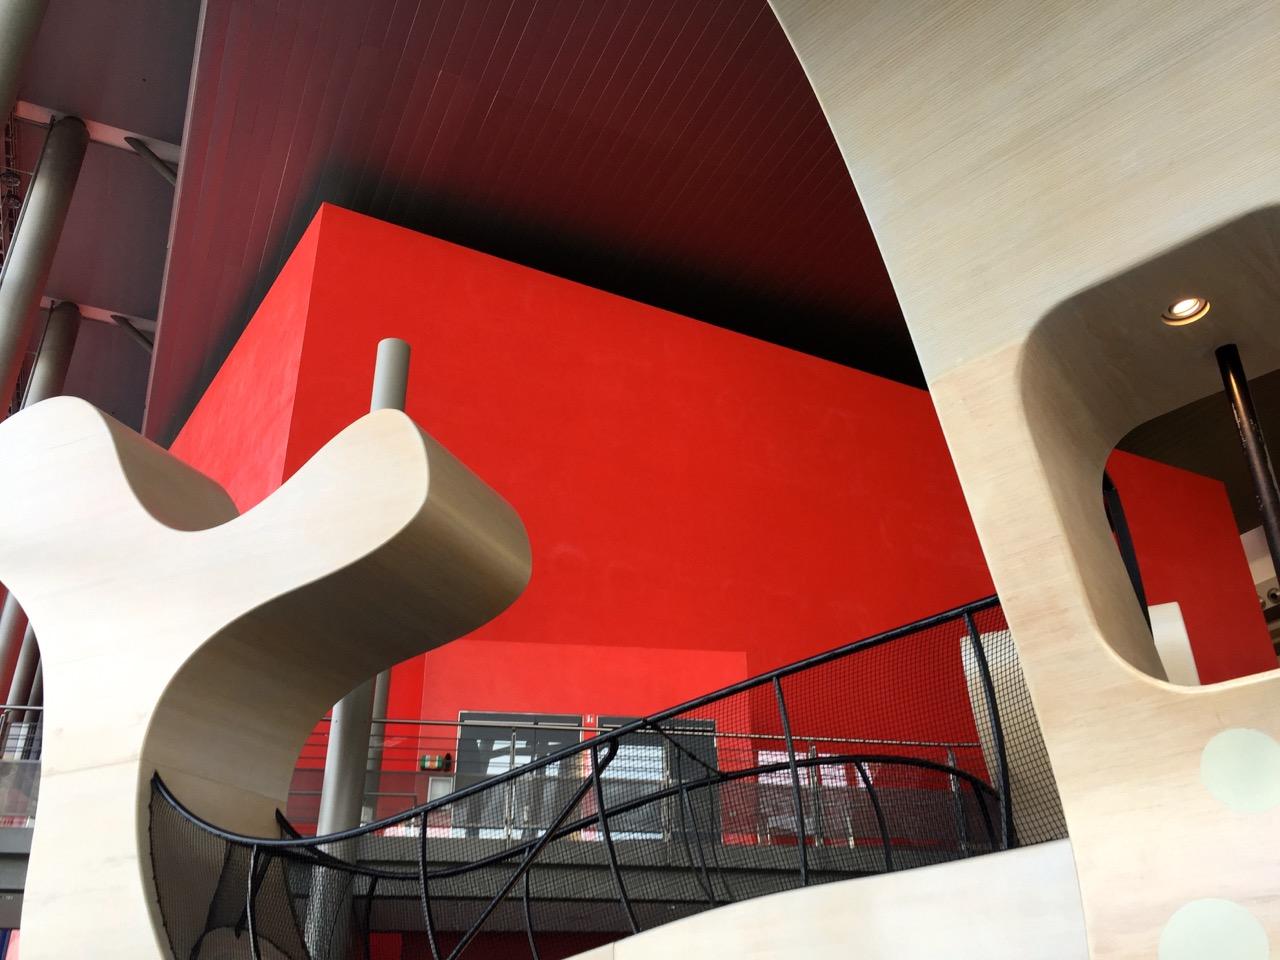 Autowelt Wolfsburg Indoor Kinderspielplatz